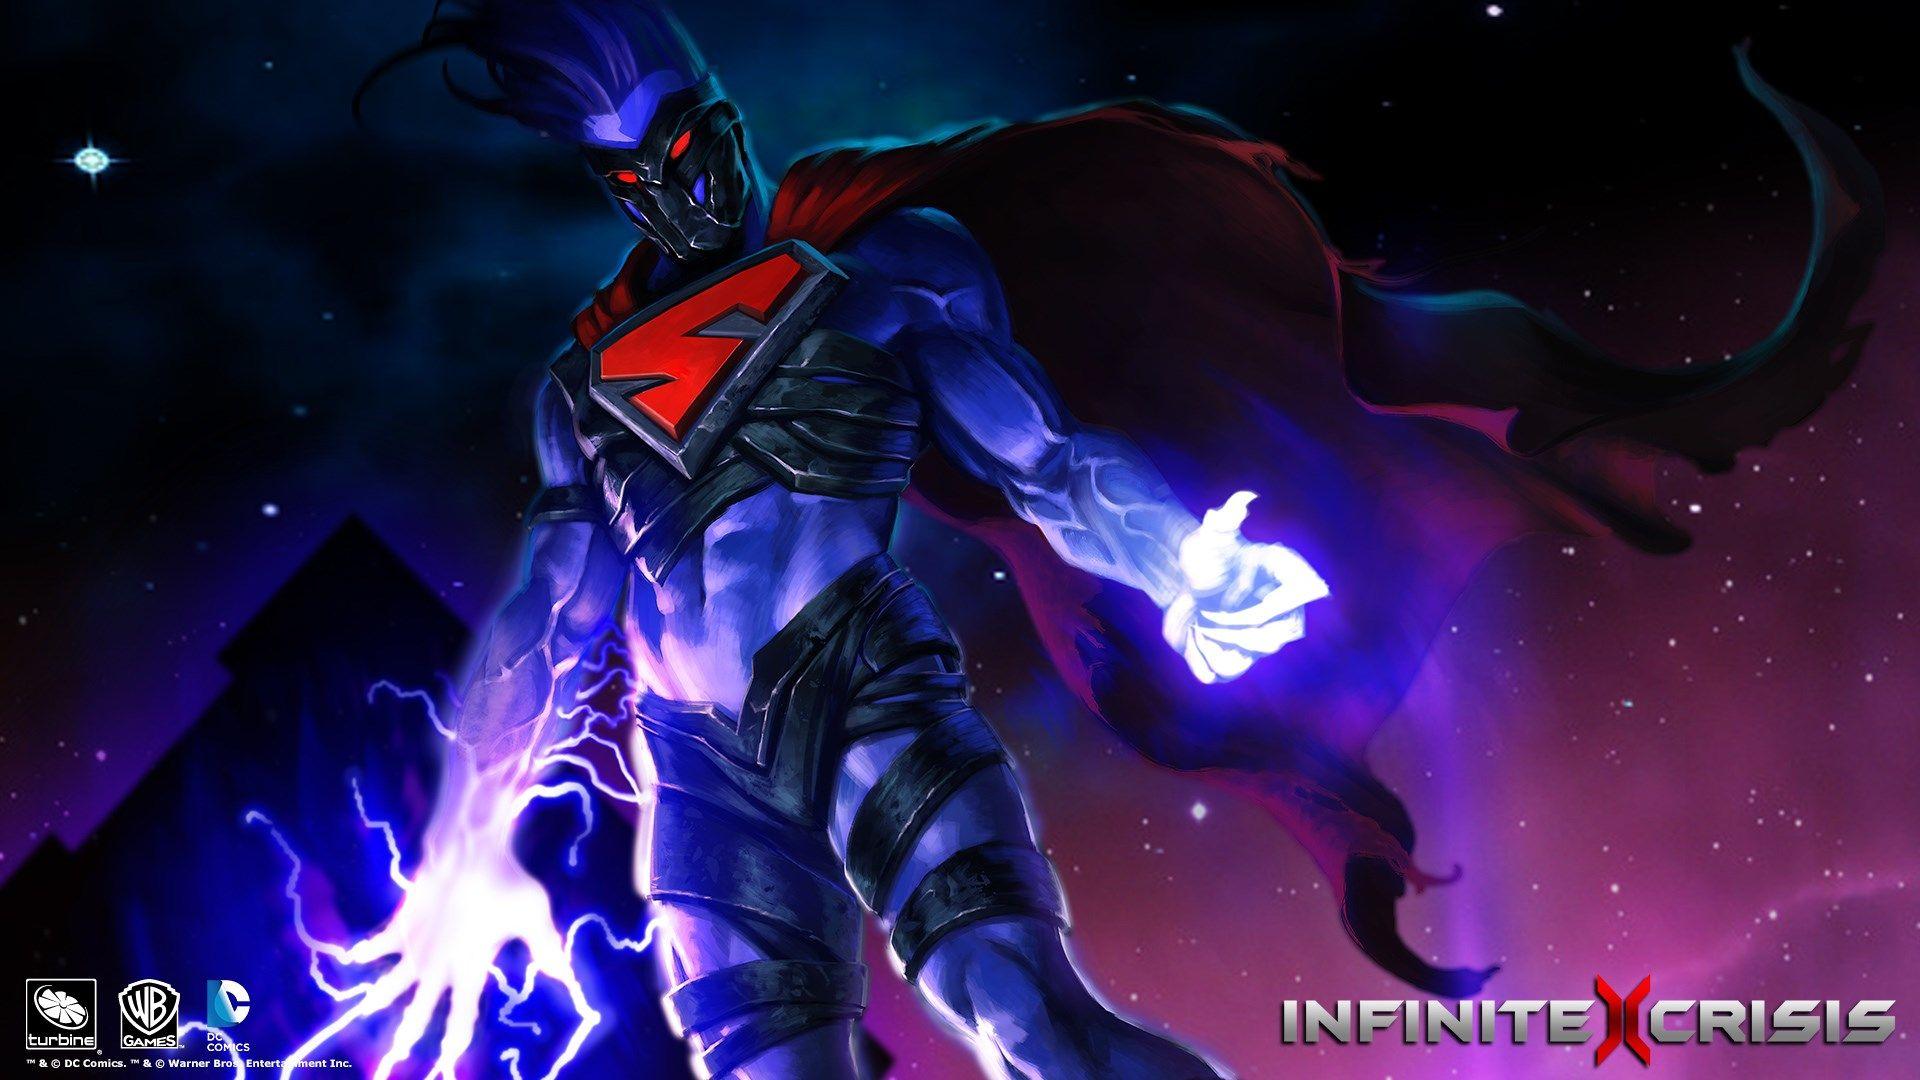 Обои clark kent, superman, kal-el, dc comics, infinite crisis, Warner Games. Игры foto 14